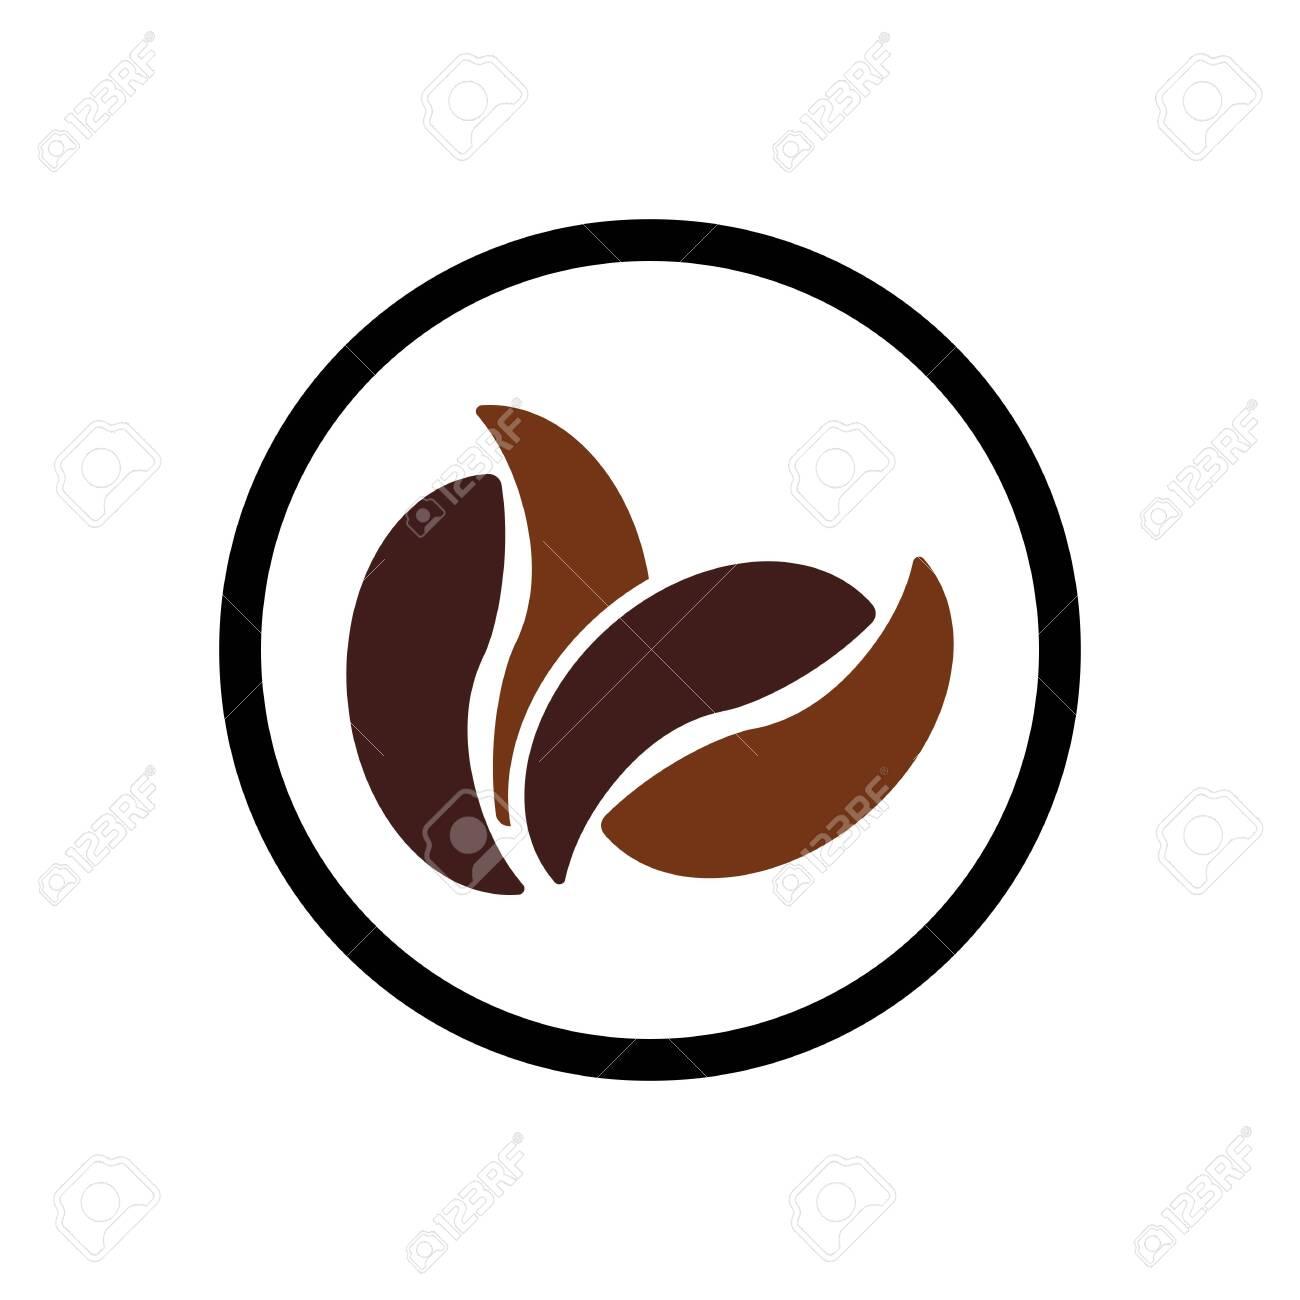 coffee bean icon vector illustration template - 141876493